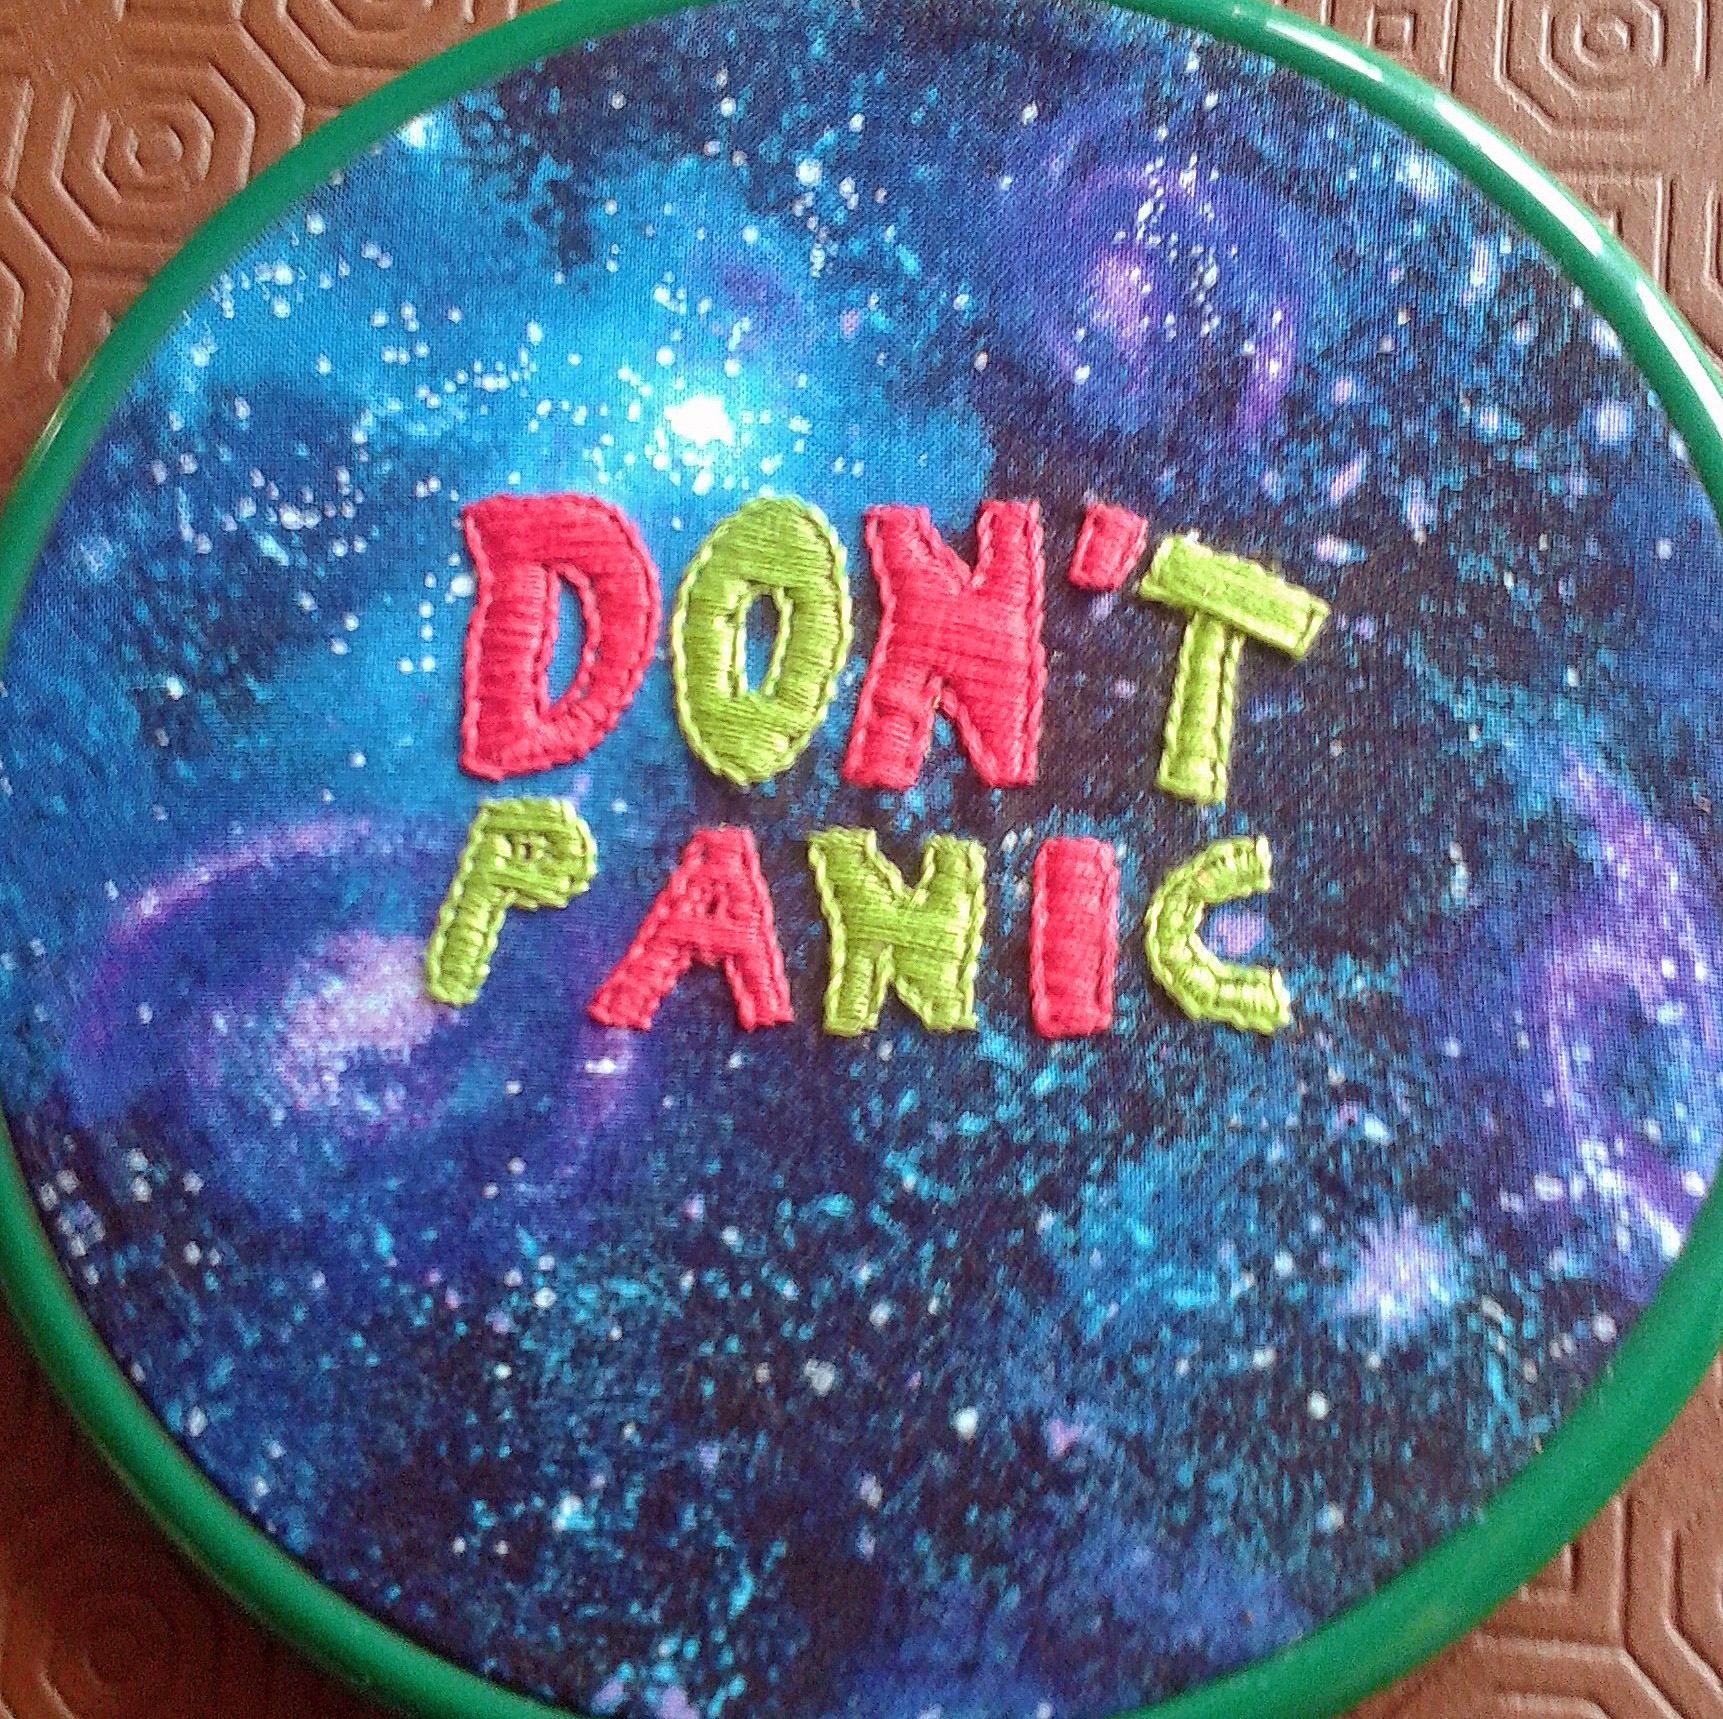 2015-07-17 Don't Panic hoop art